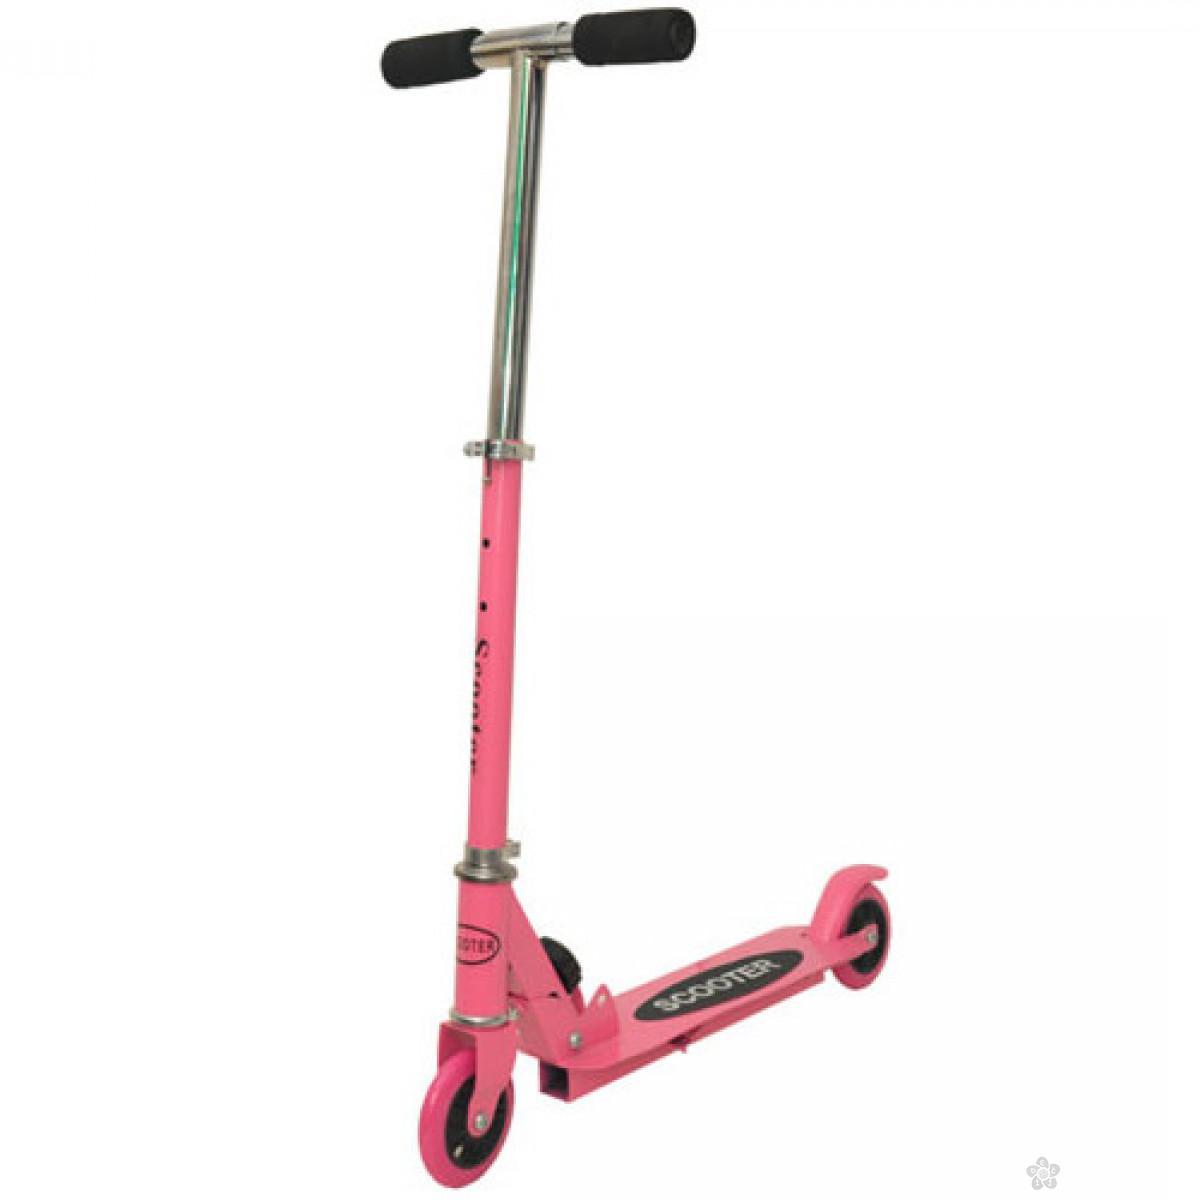 Trotinet sklopivi pink do 20 kg, 0127126